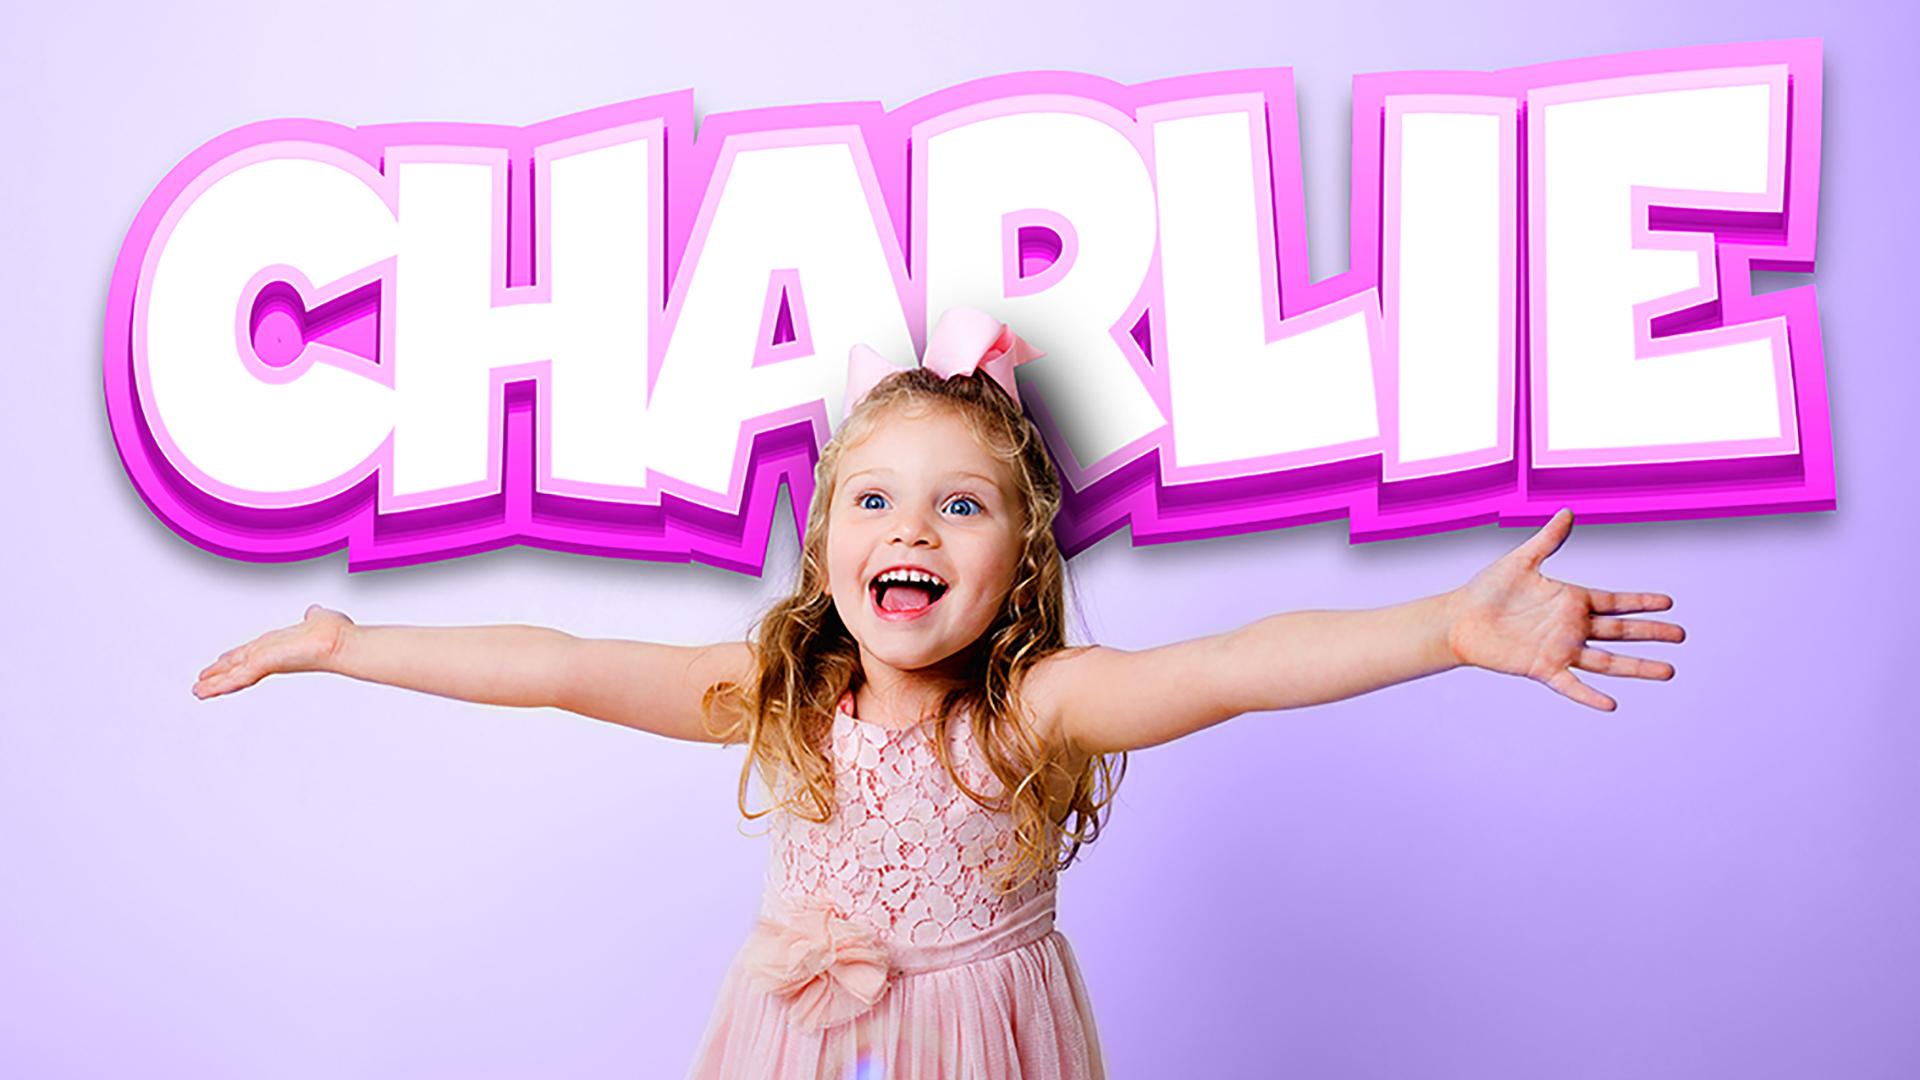 Charlie - Season 5